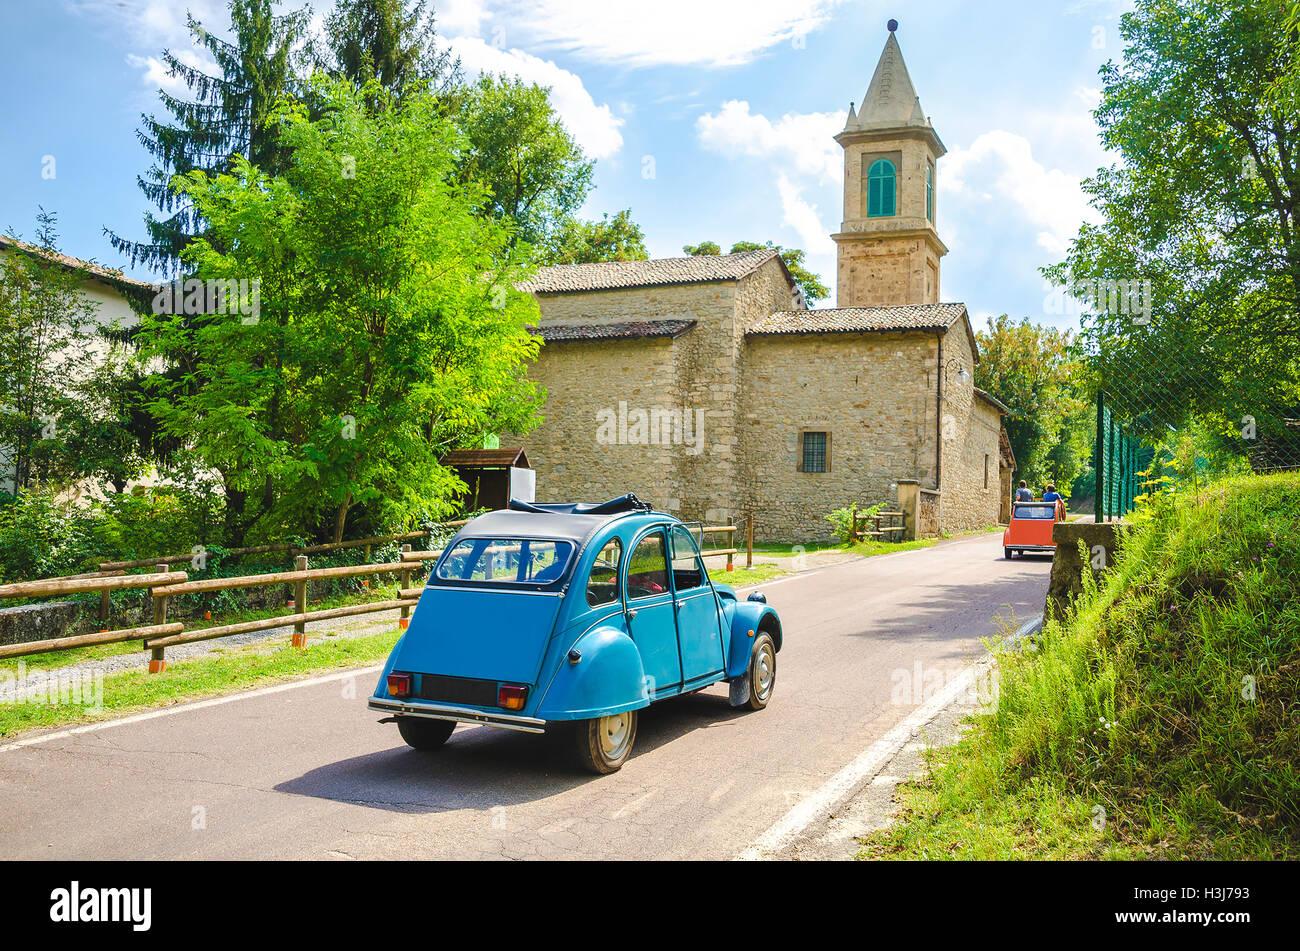 Italia viaje por carretera de coches de época iglesia rural Viajes Imagen De Stock